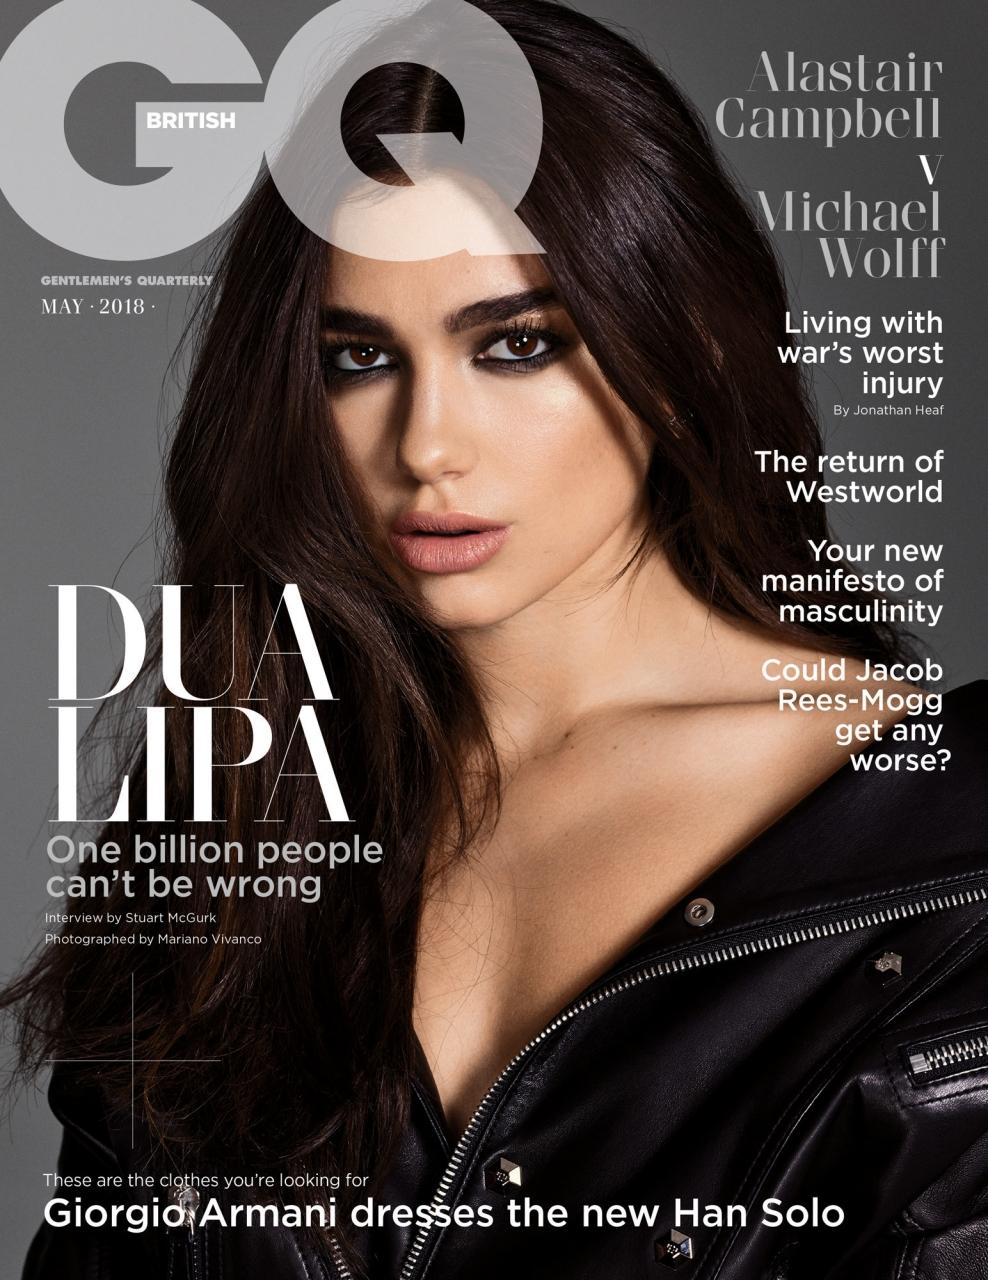 Dua Lipa by Mariano Vivanco for British GQ, May 2018